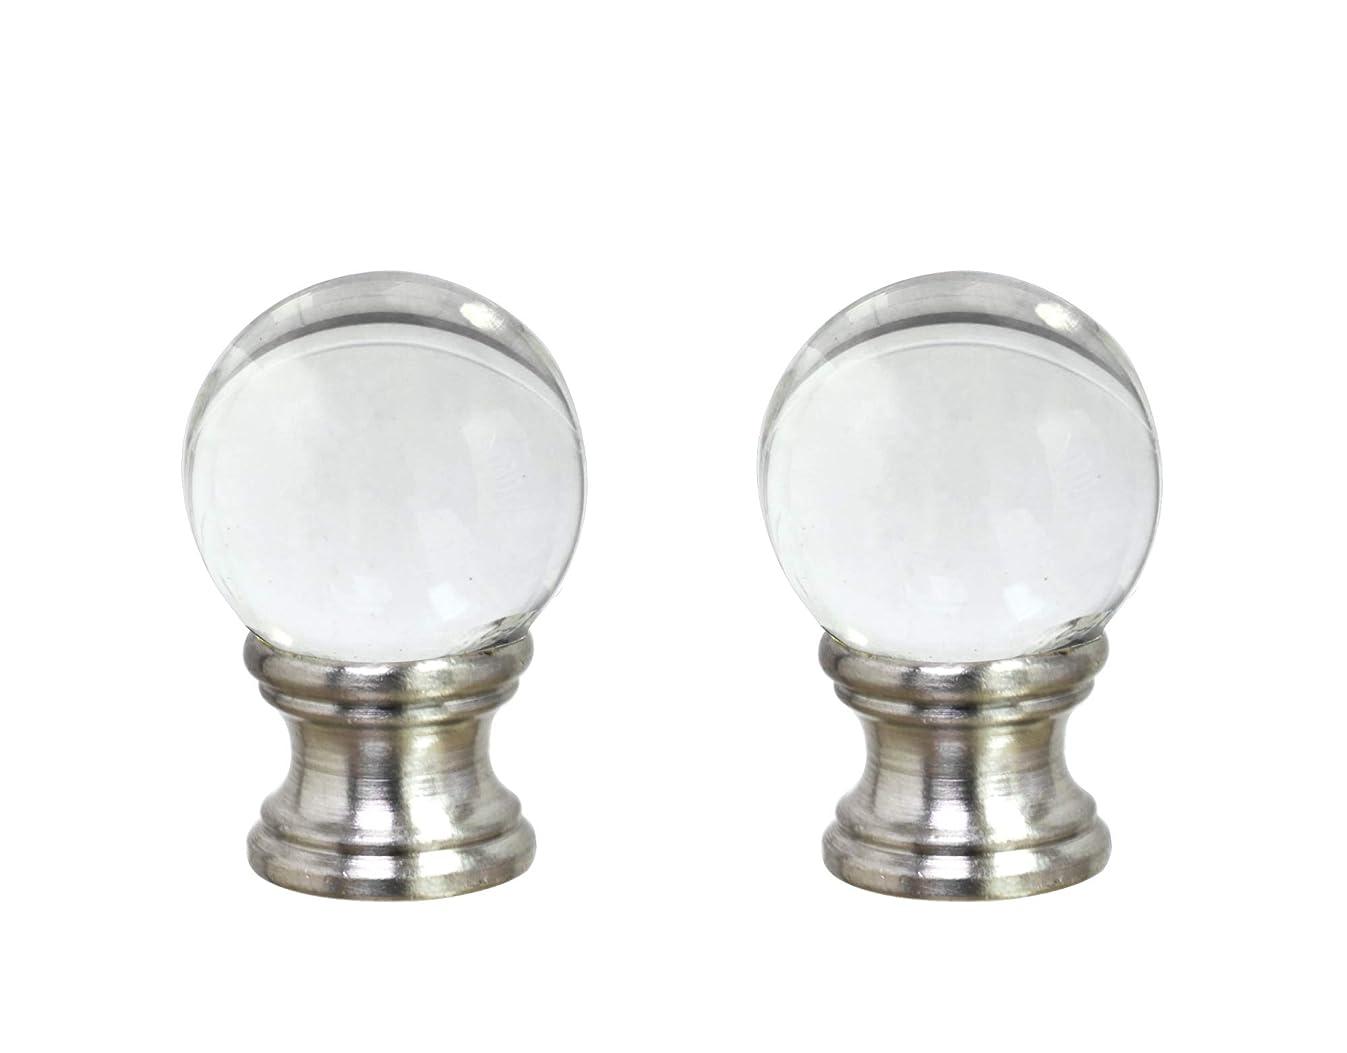 Aspen Creative 24014-12, 2 Pack Clear Glass Ball Lamp Nickel Finish, 1 1/2